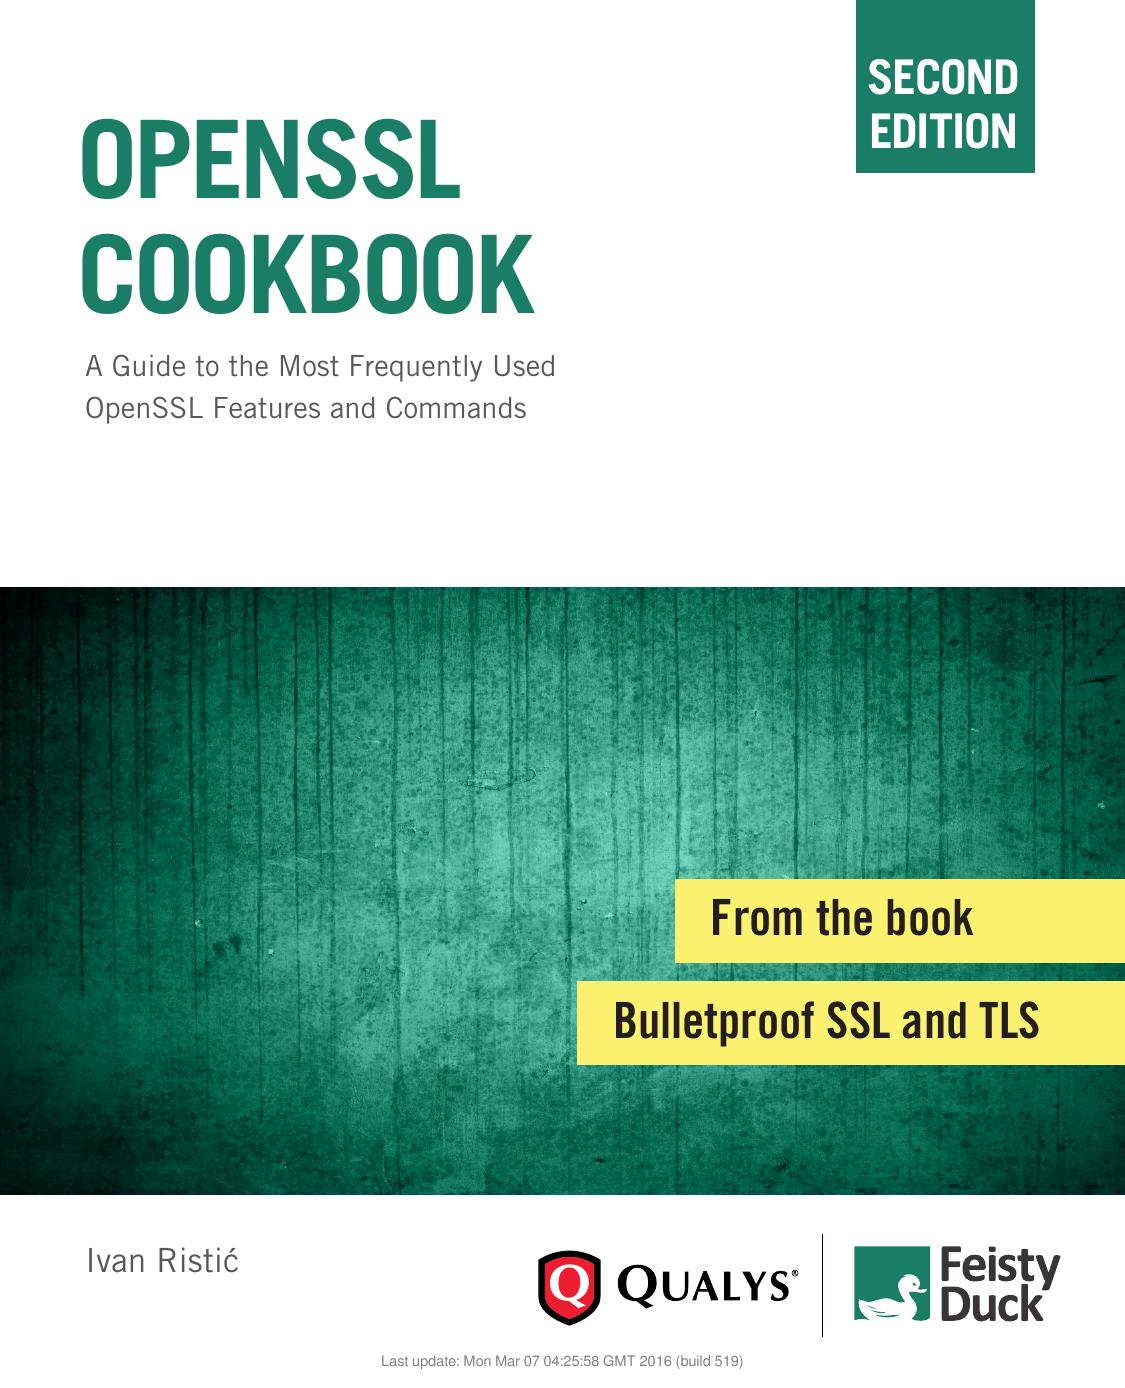 OpenSSL Cookbook 2ed - Ristić, Ivan 5583